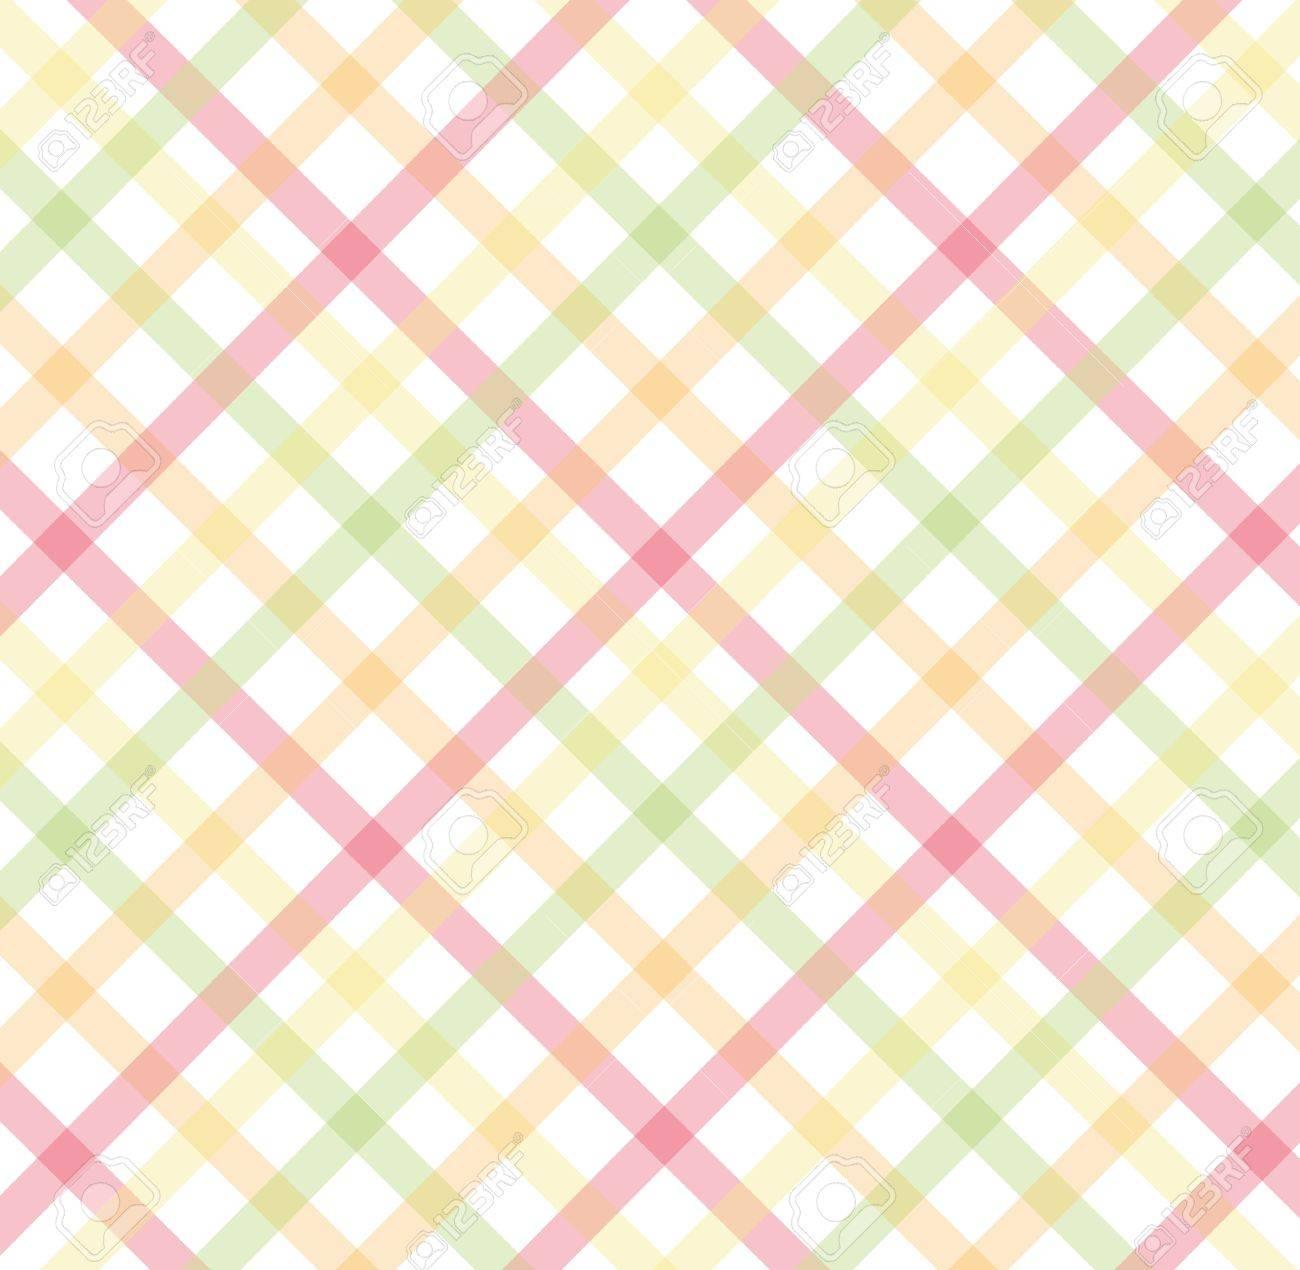 Pink Yellow Green Diagonal Pattern Royalty Free Cliparts Vectors And Stock Illustration Image 19337280